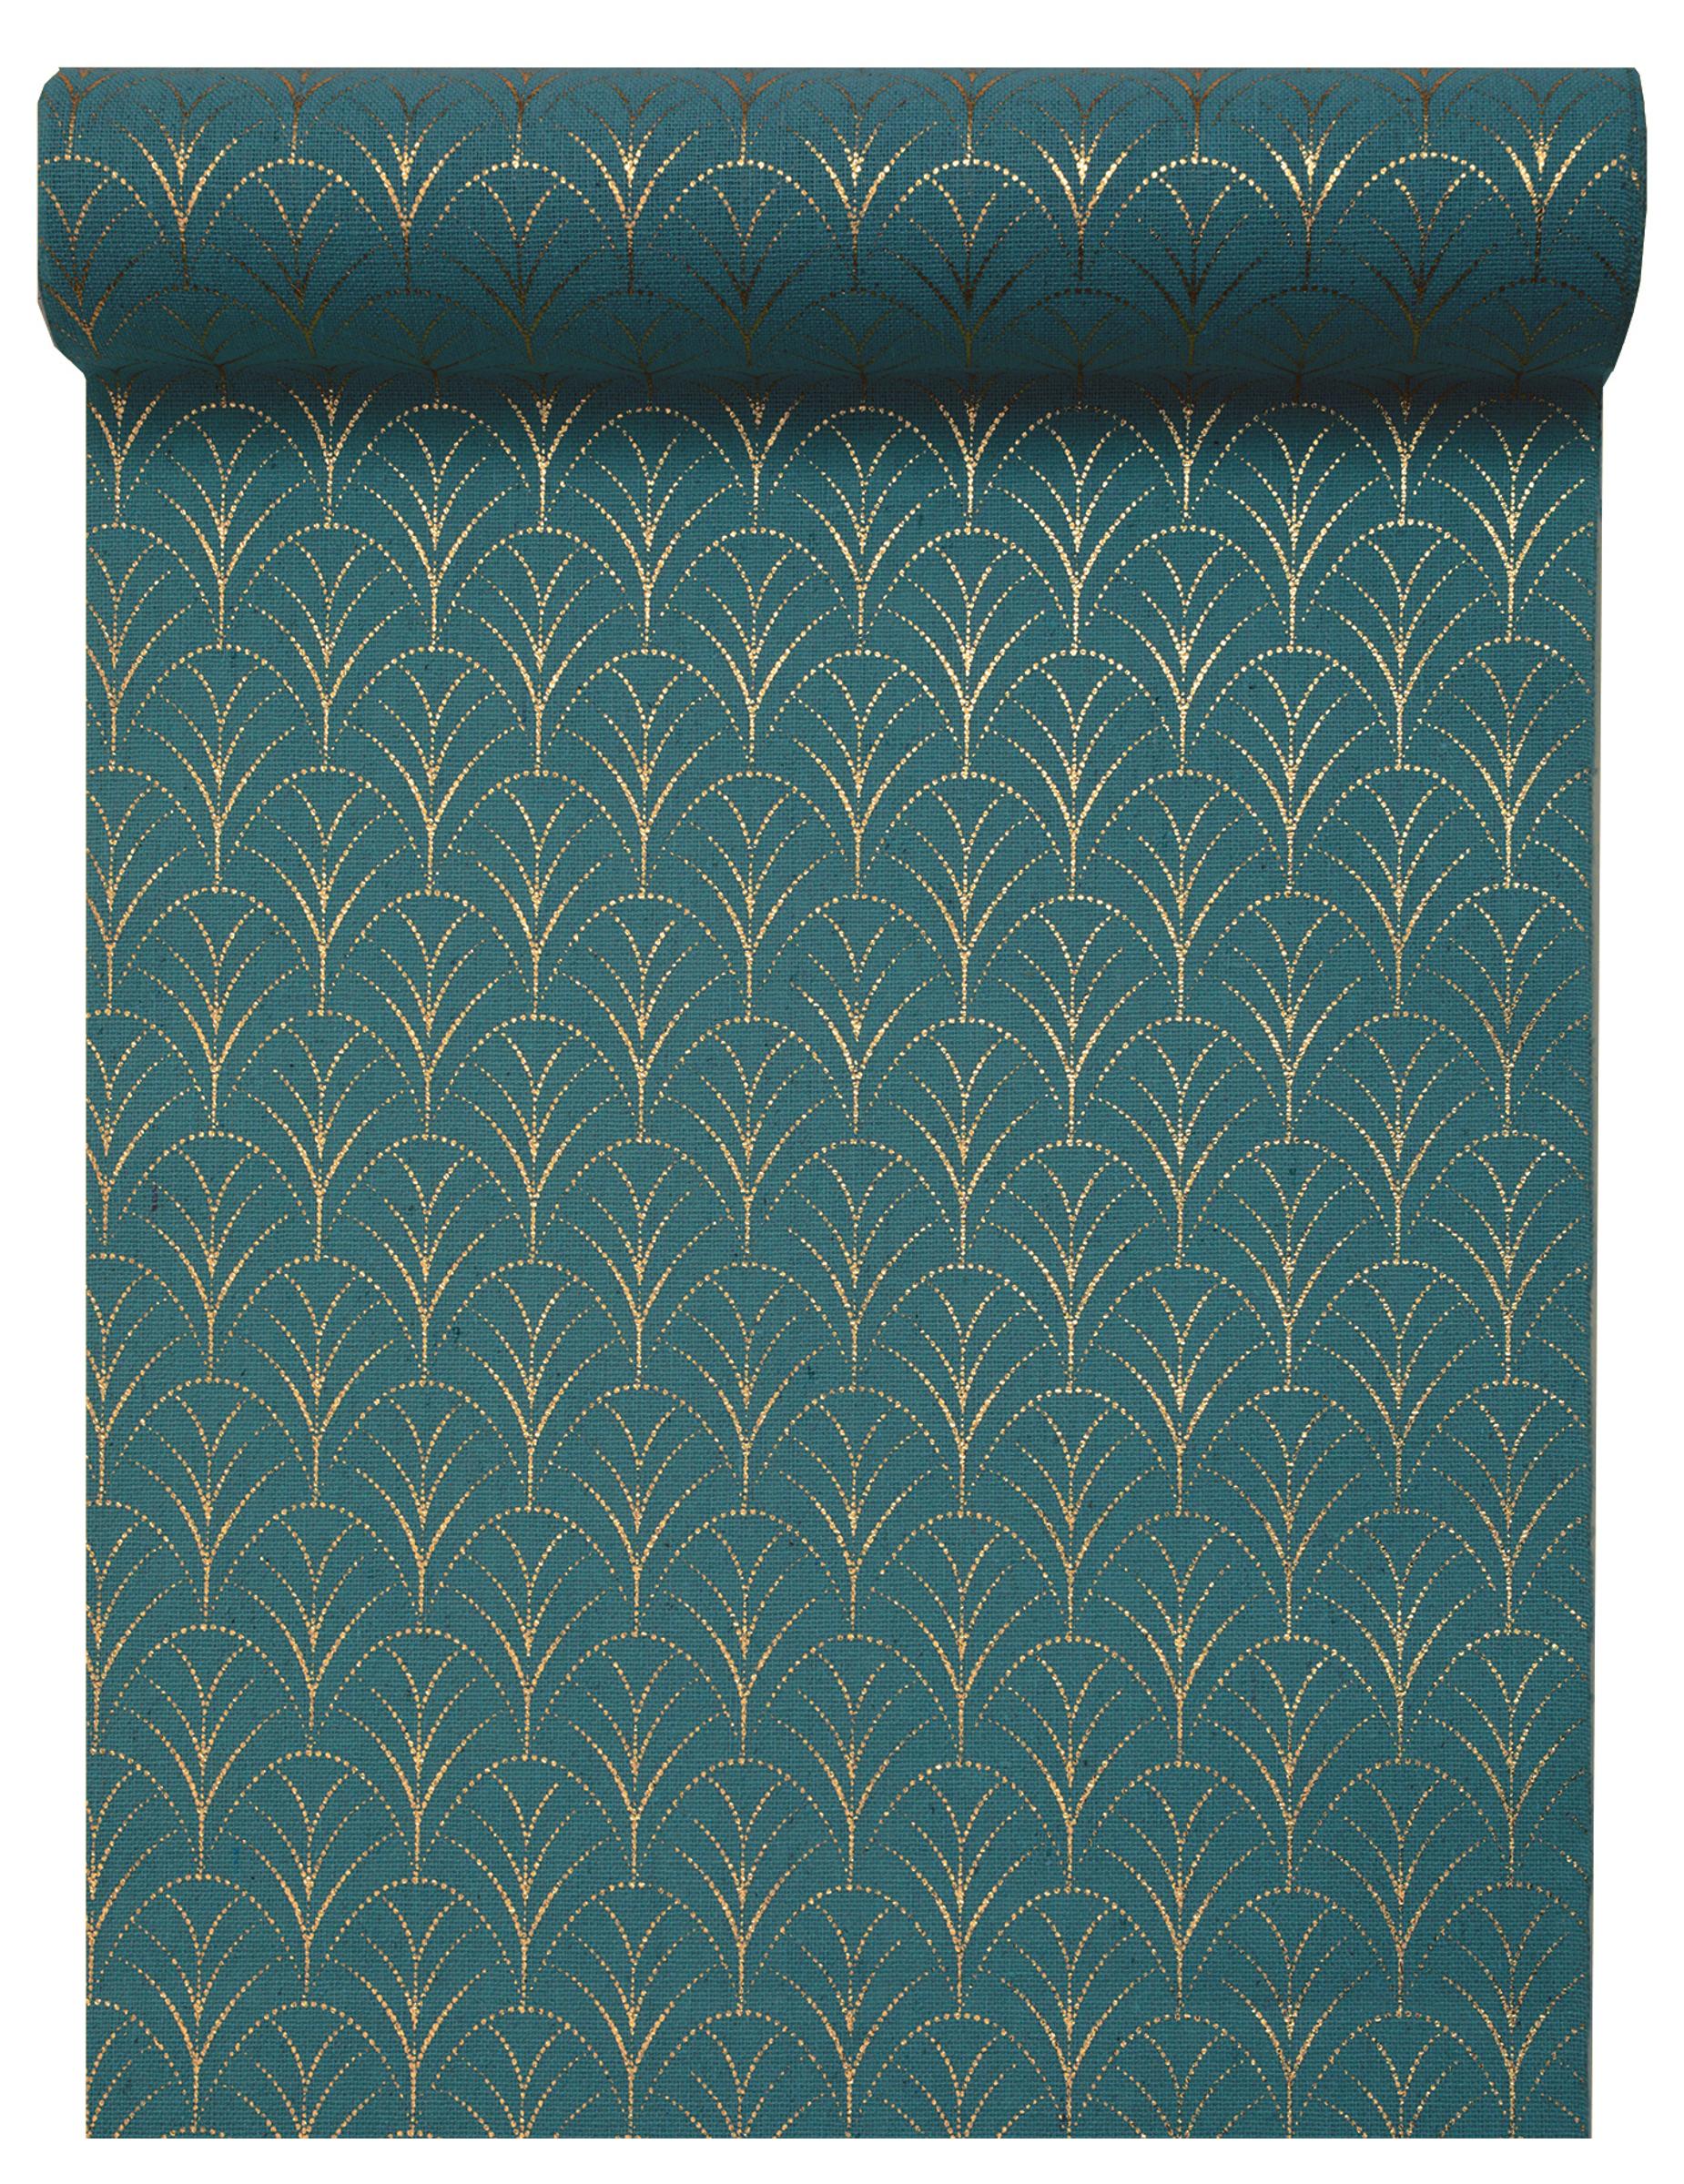 chemin de table coton art d co bleu canard et dor. Black Bedroom Furniture Sets. Home Design Ideas